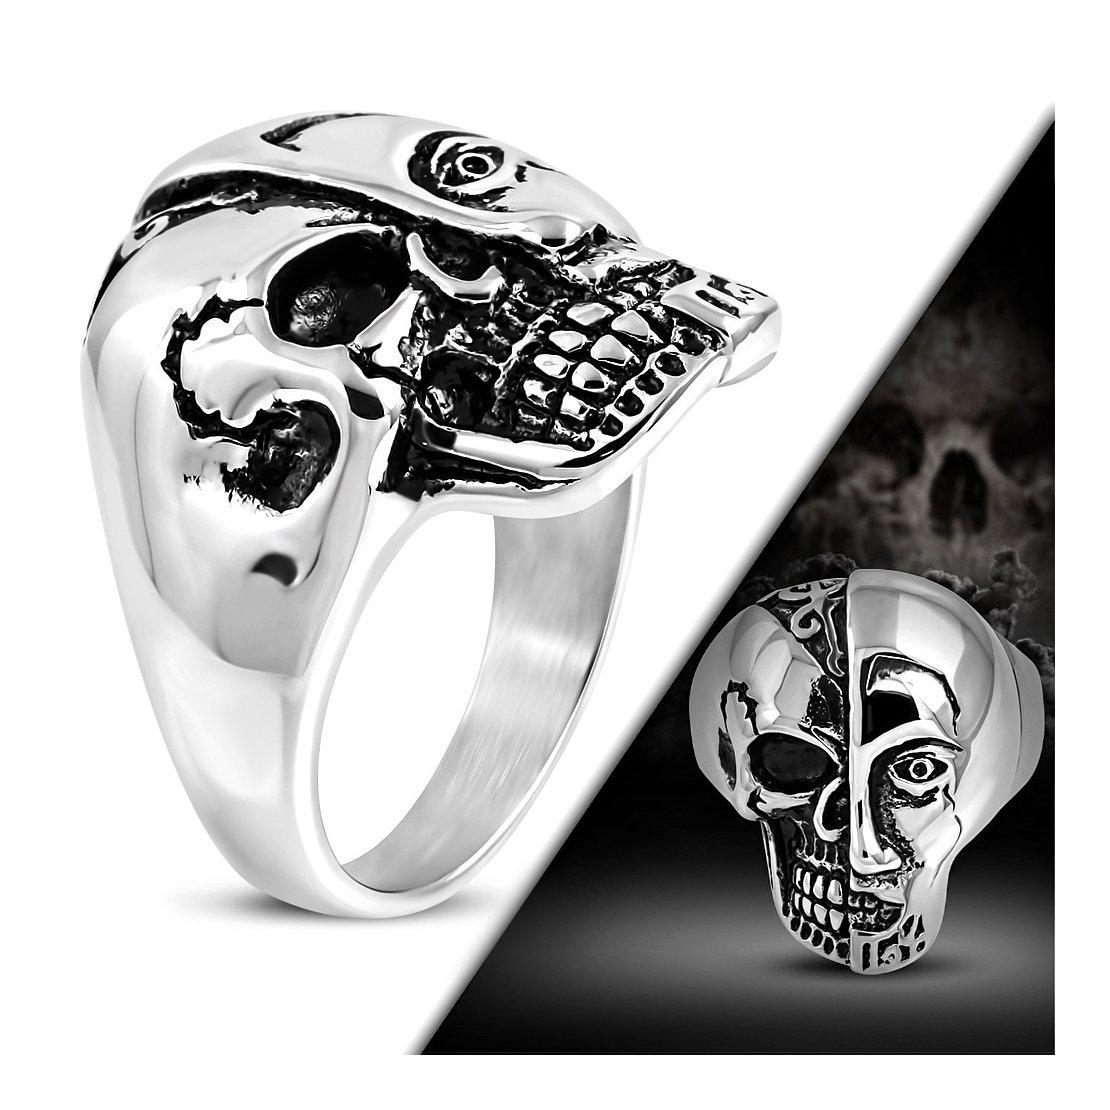 Stainless Steel 2 Color Two Face Skull Biker Ring